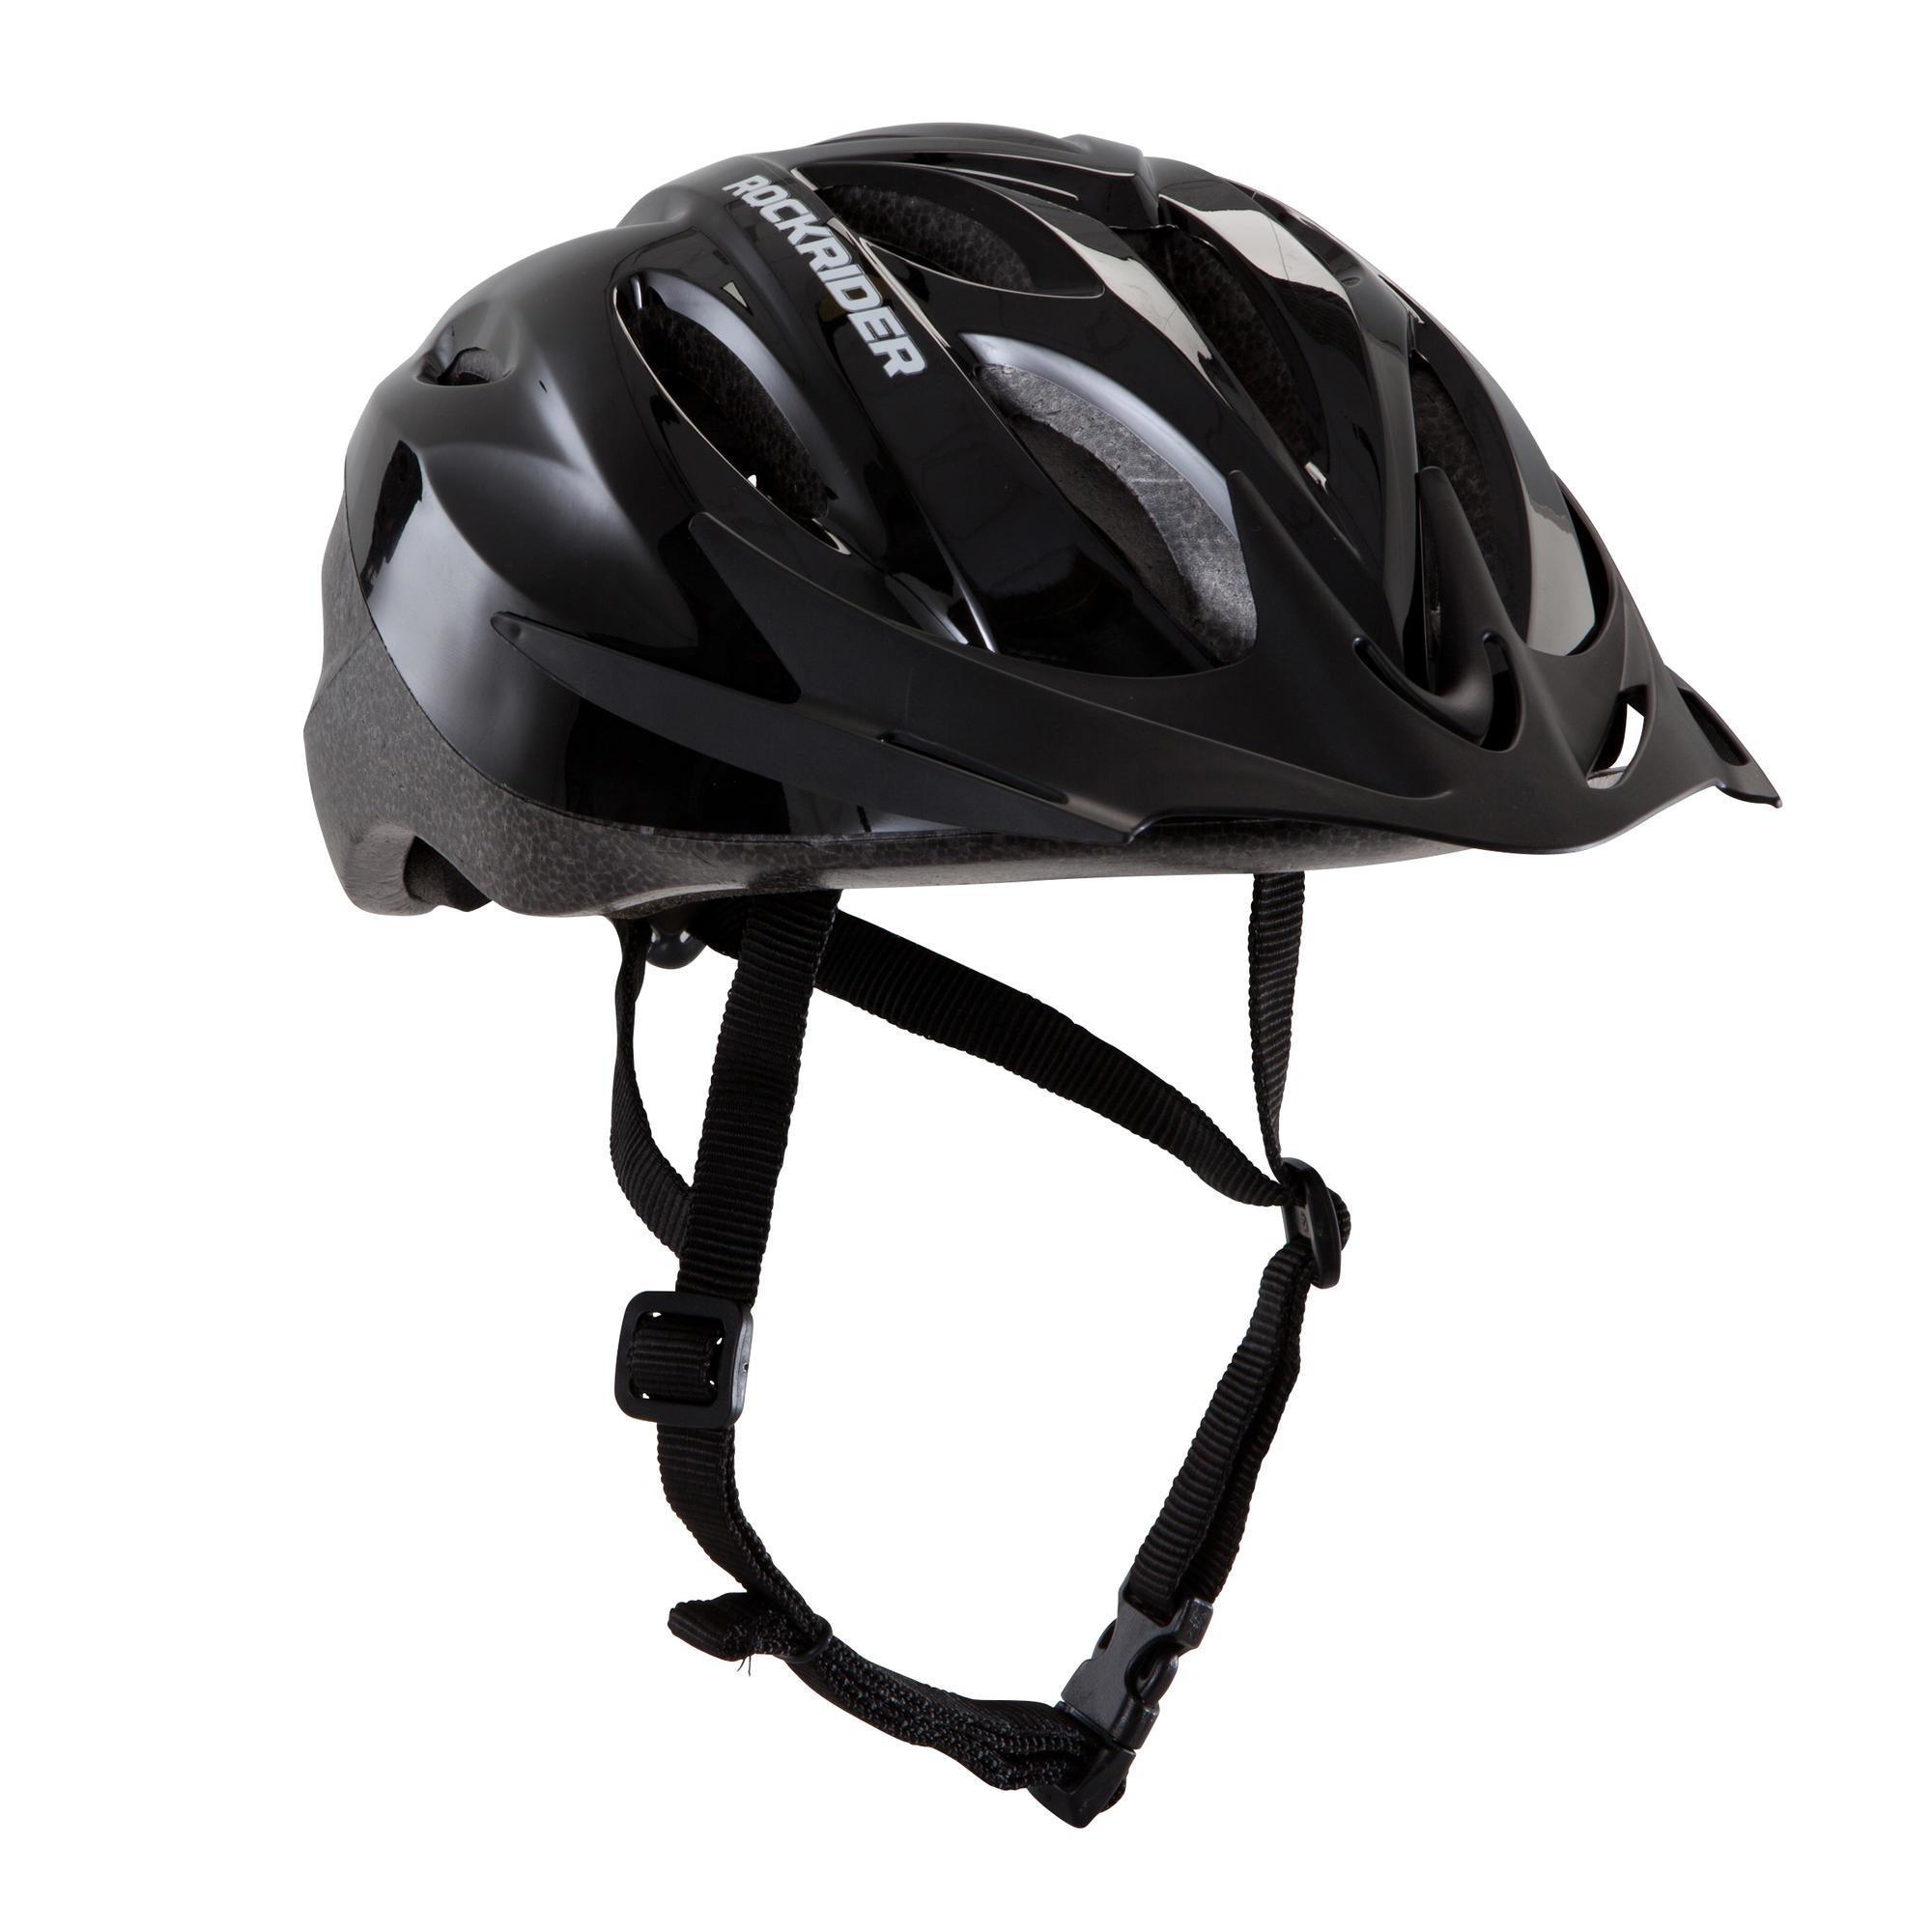 Rockrider MTB-helm Rockrider ST 50 zwart kopen